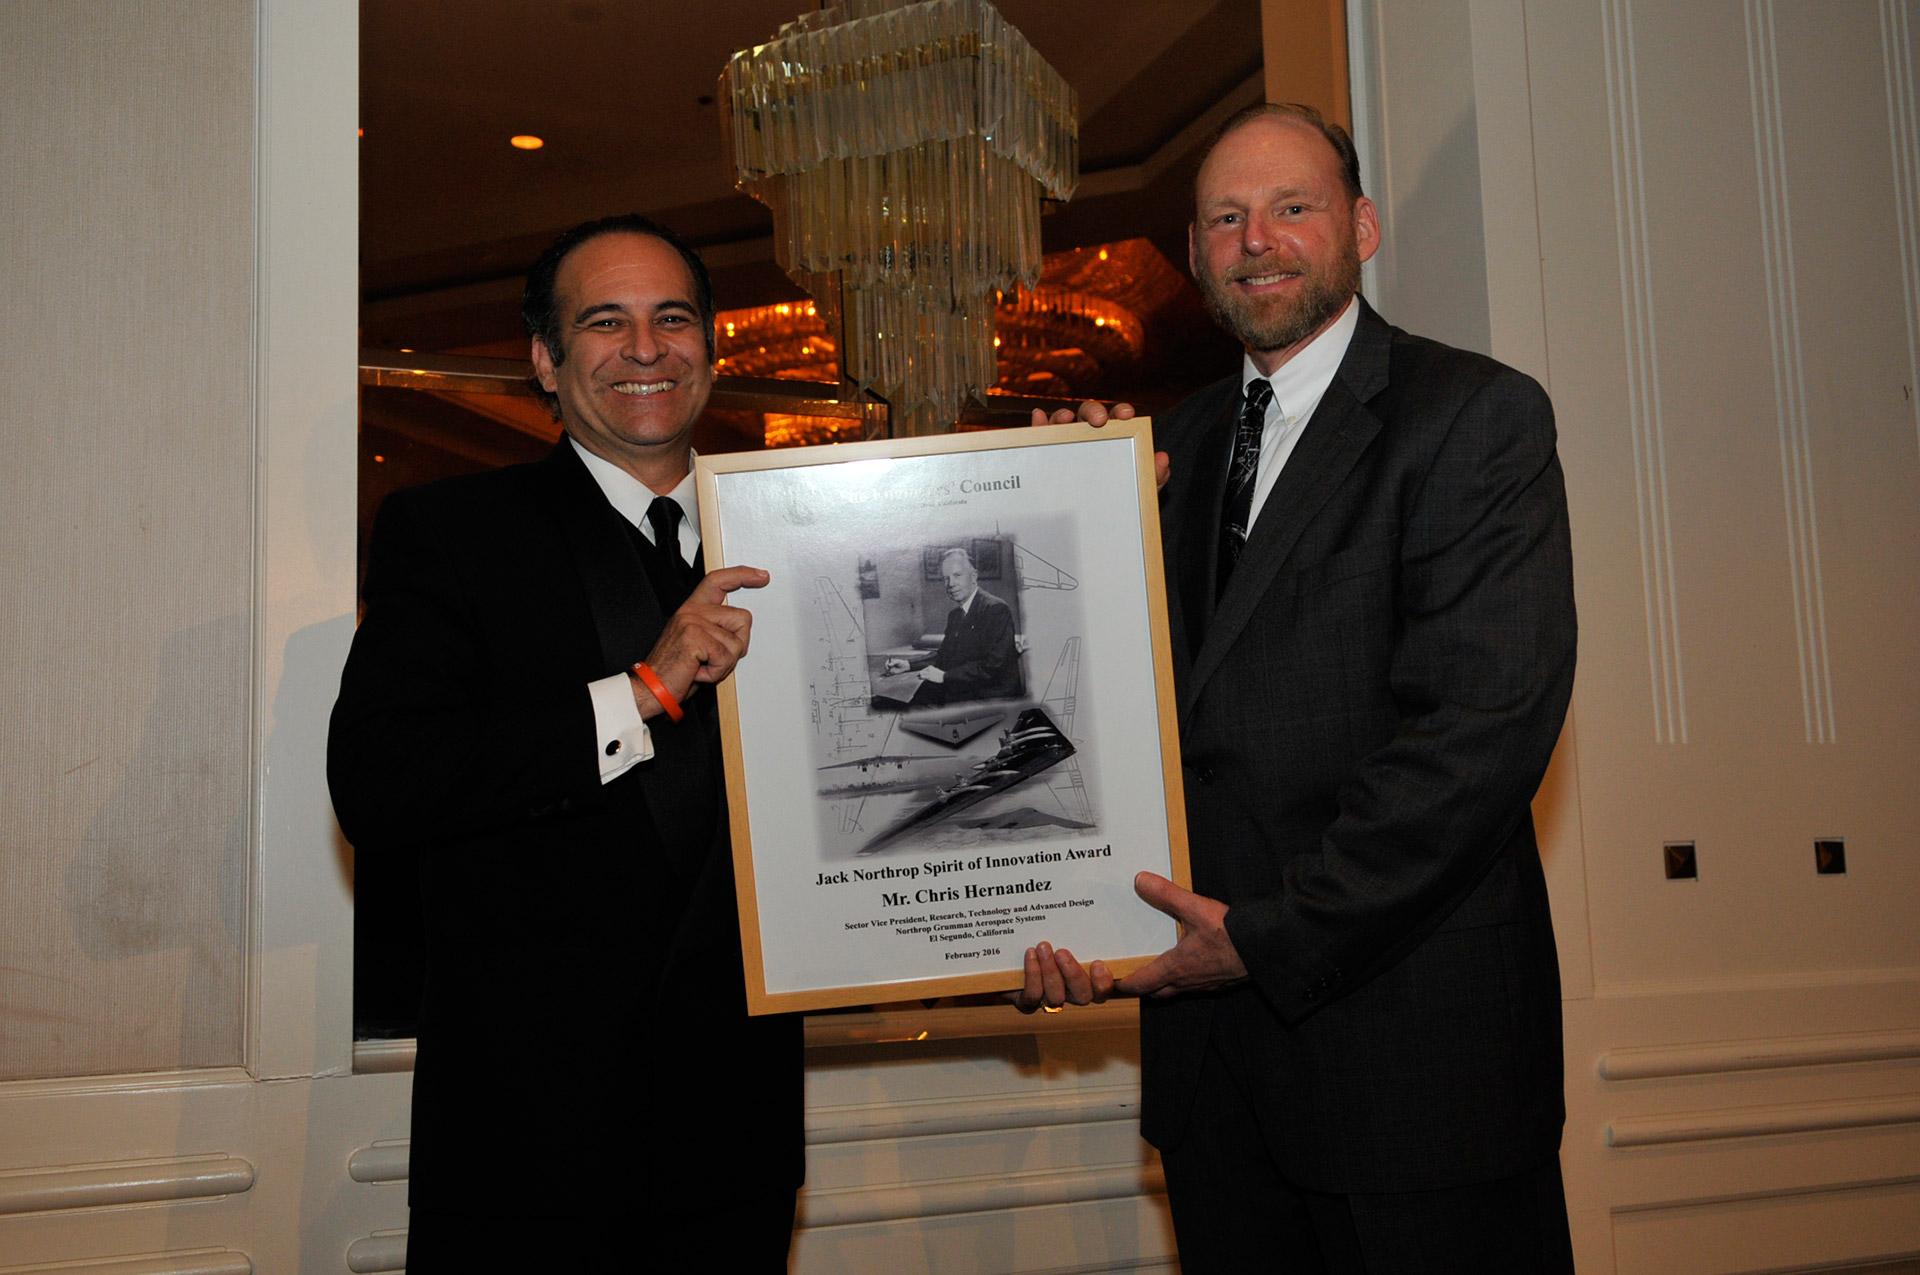 Chris Hernandez – 2016 Jack Northrop Spirit of Innovation Award